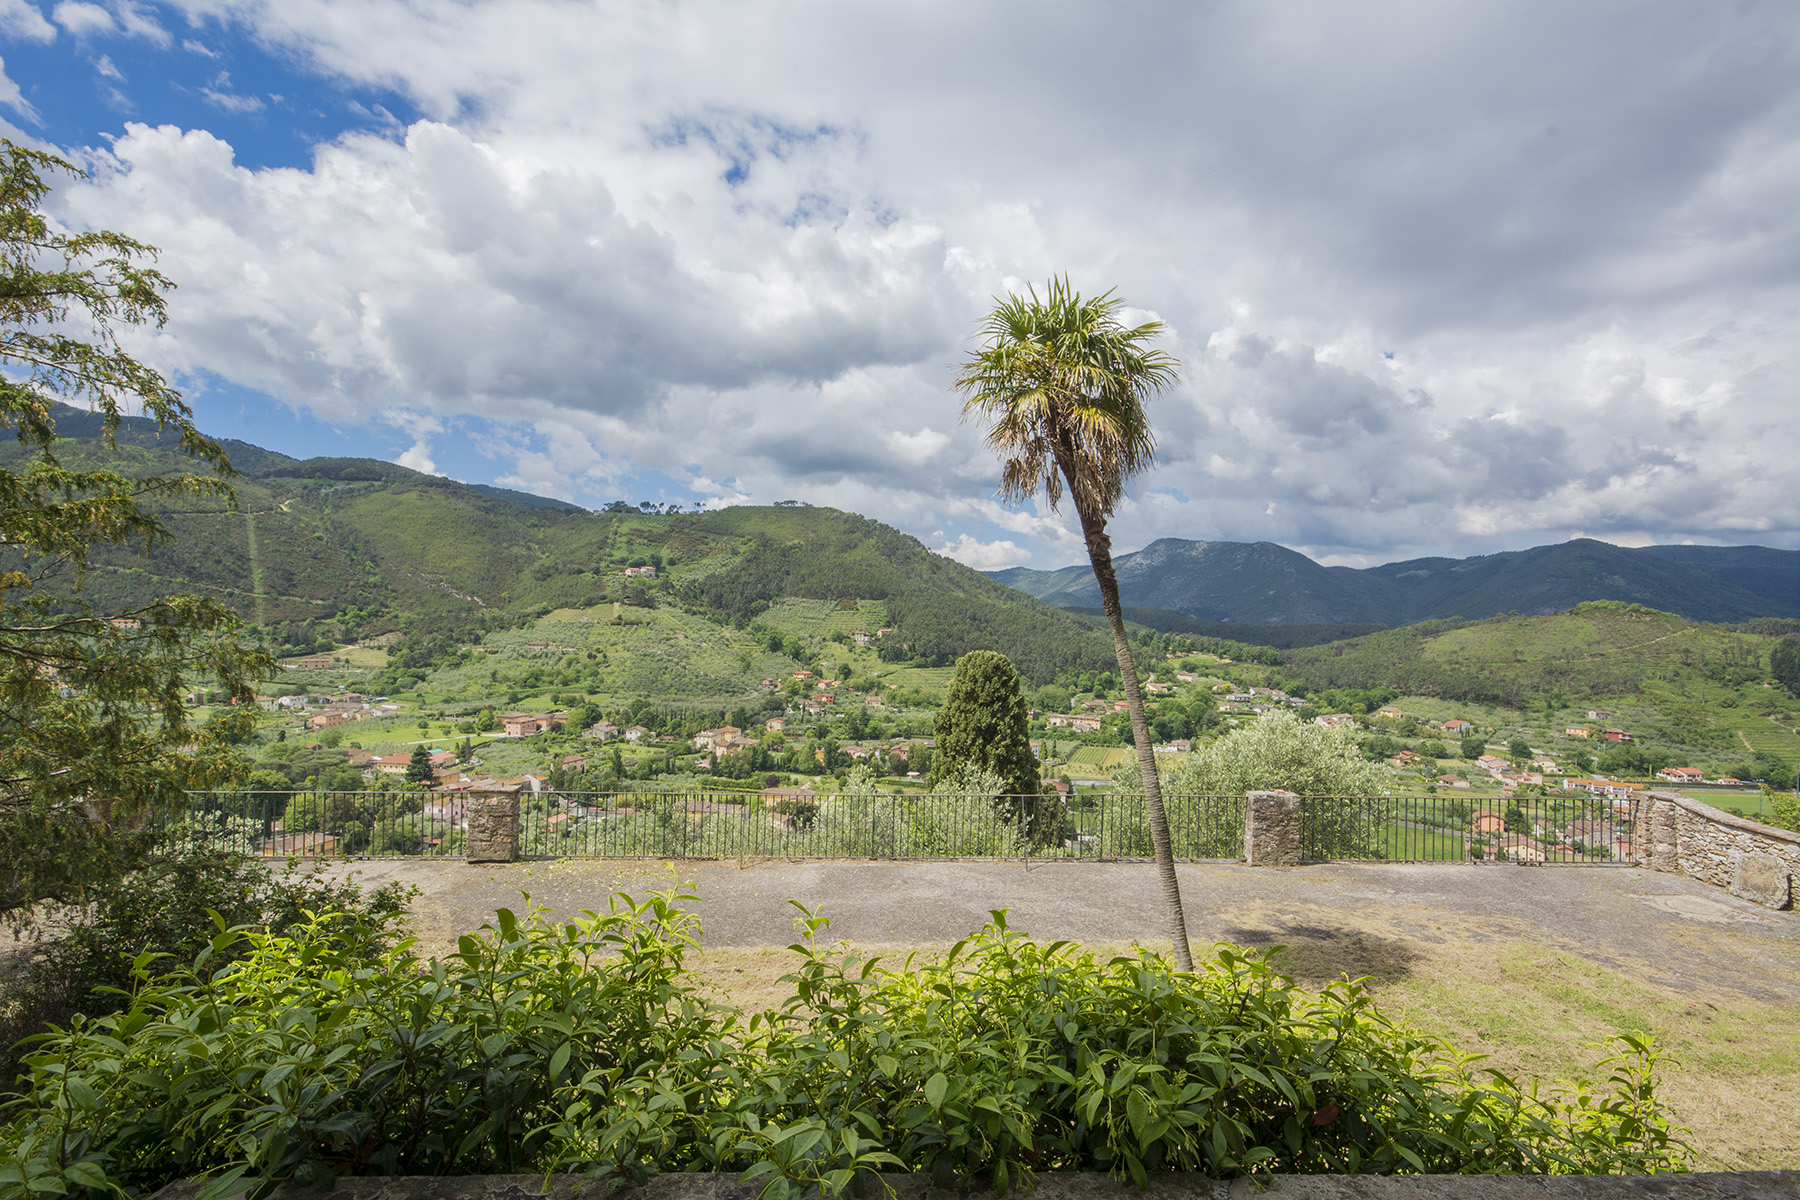 Villa in Vendita a Capannori: 5 locali, 490 mq - Foto 8